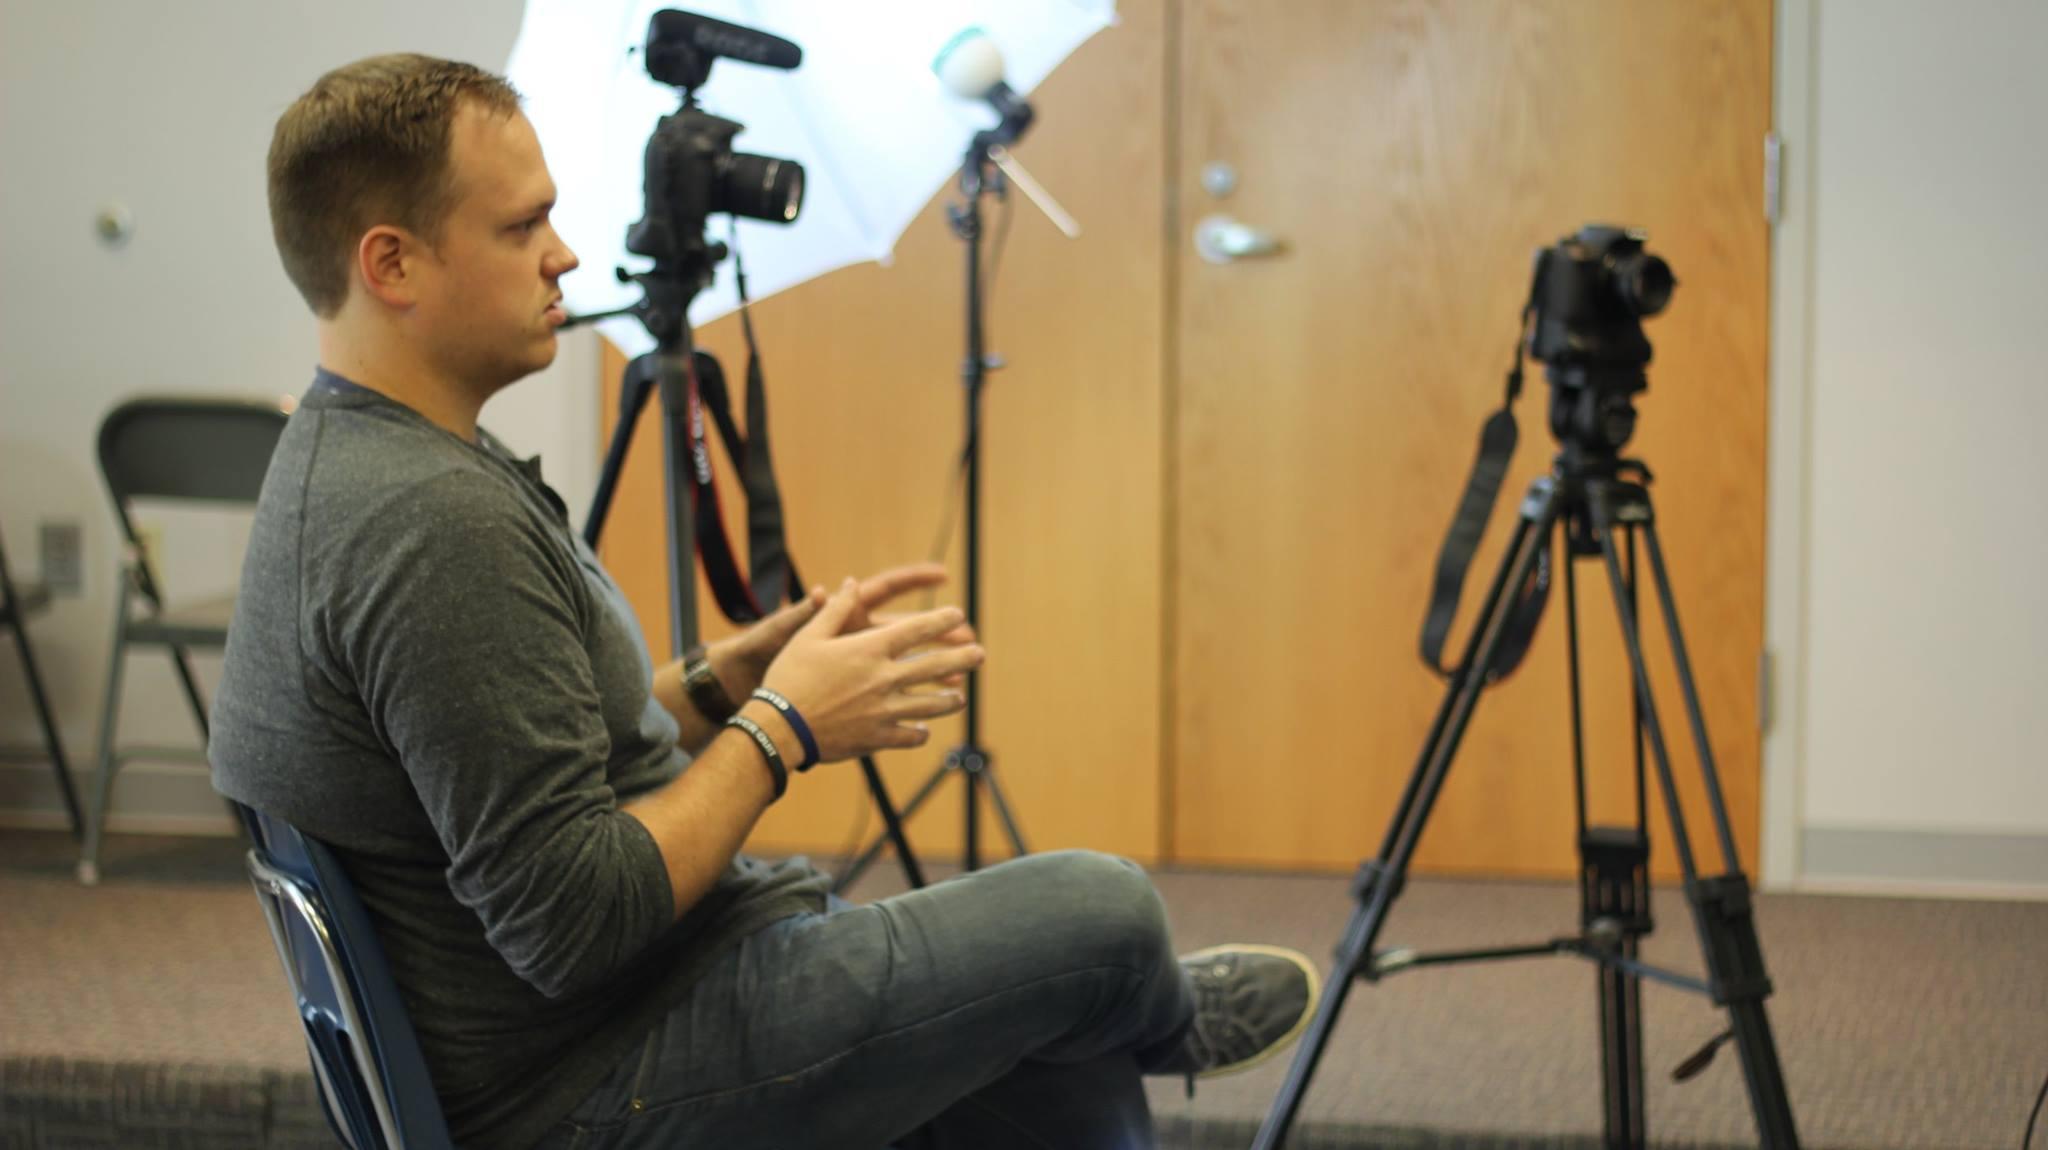 Patrick W. SHaver - DIRECTOR/PRODUCER